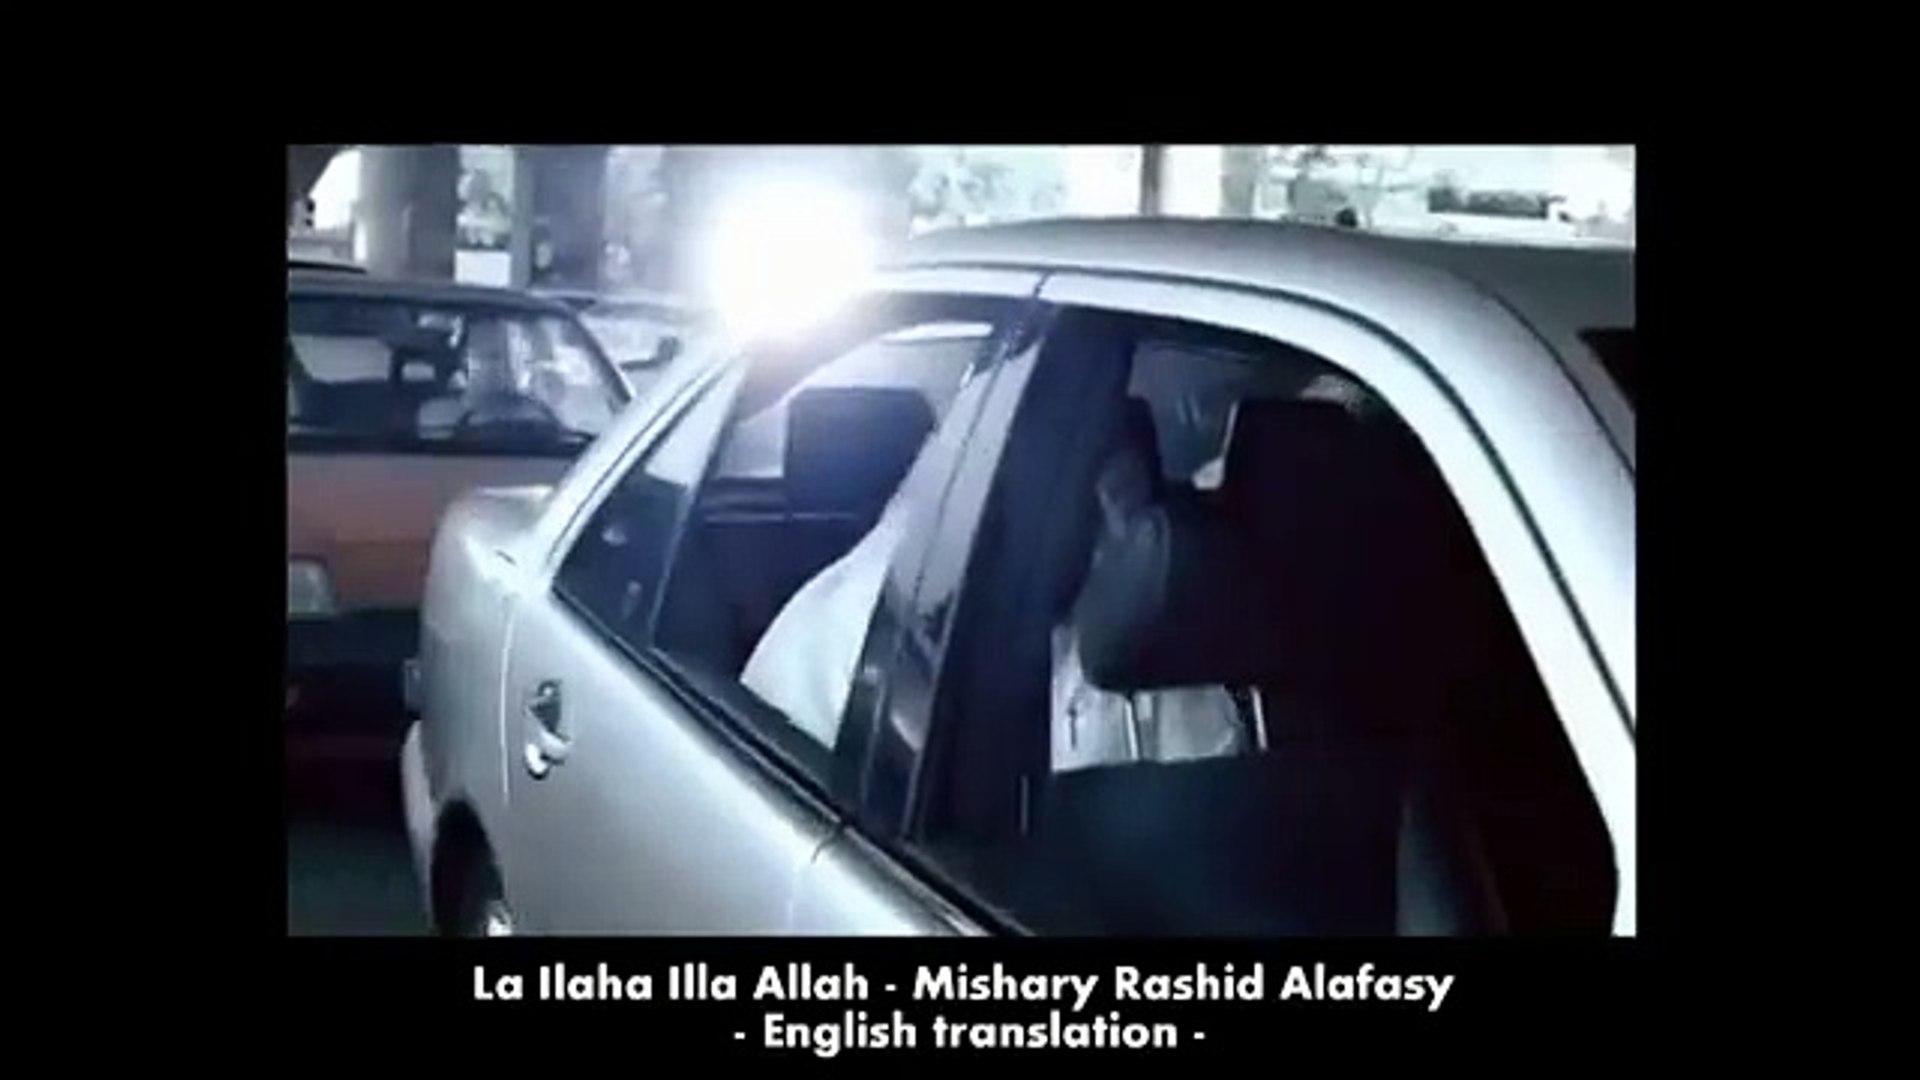 Beautiful arabic nasheed La ilaha illallah by Mishary rashid alafasy